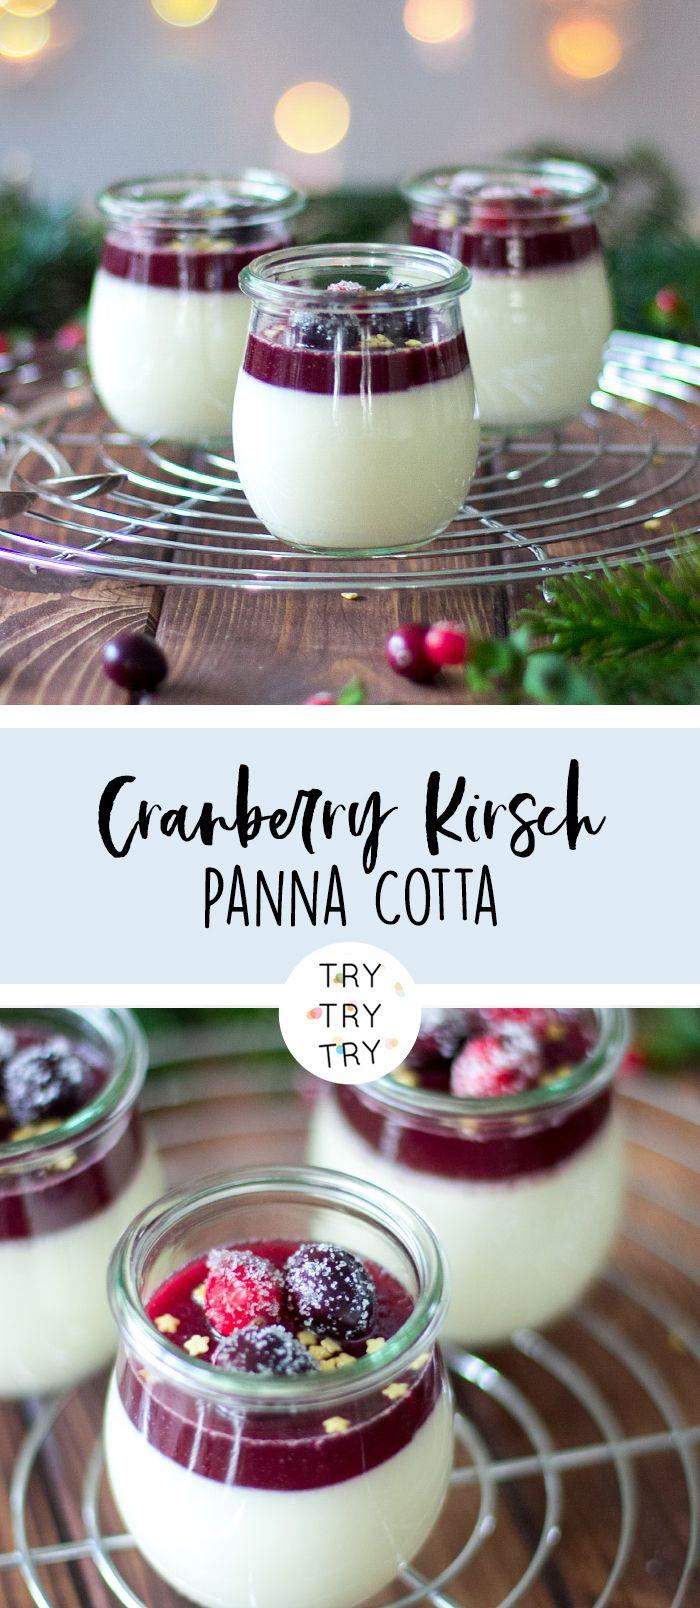 cranberry kirsch panna cotta rezept in 2019 nachtisch. Black Bedroom Furniture Sets. Home Design Ideas